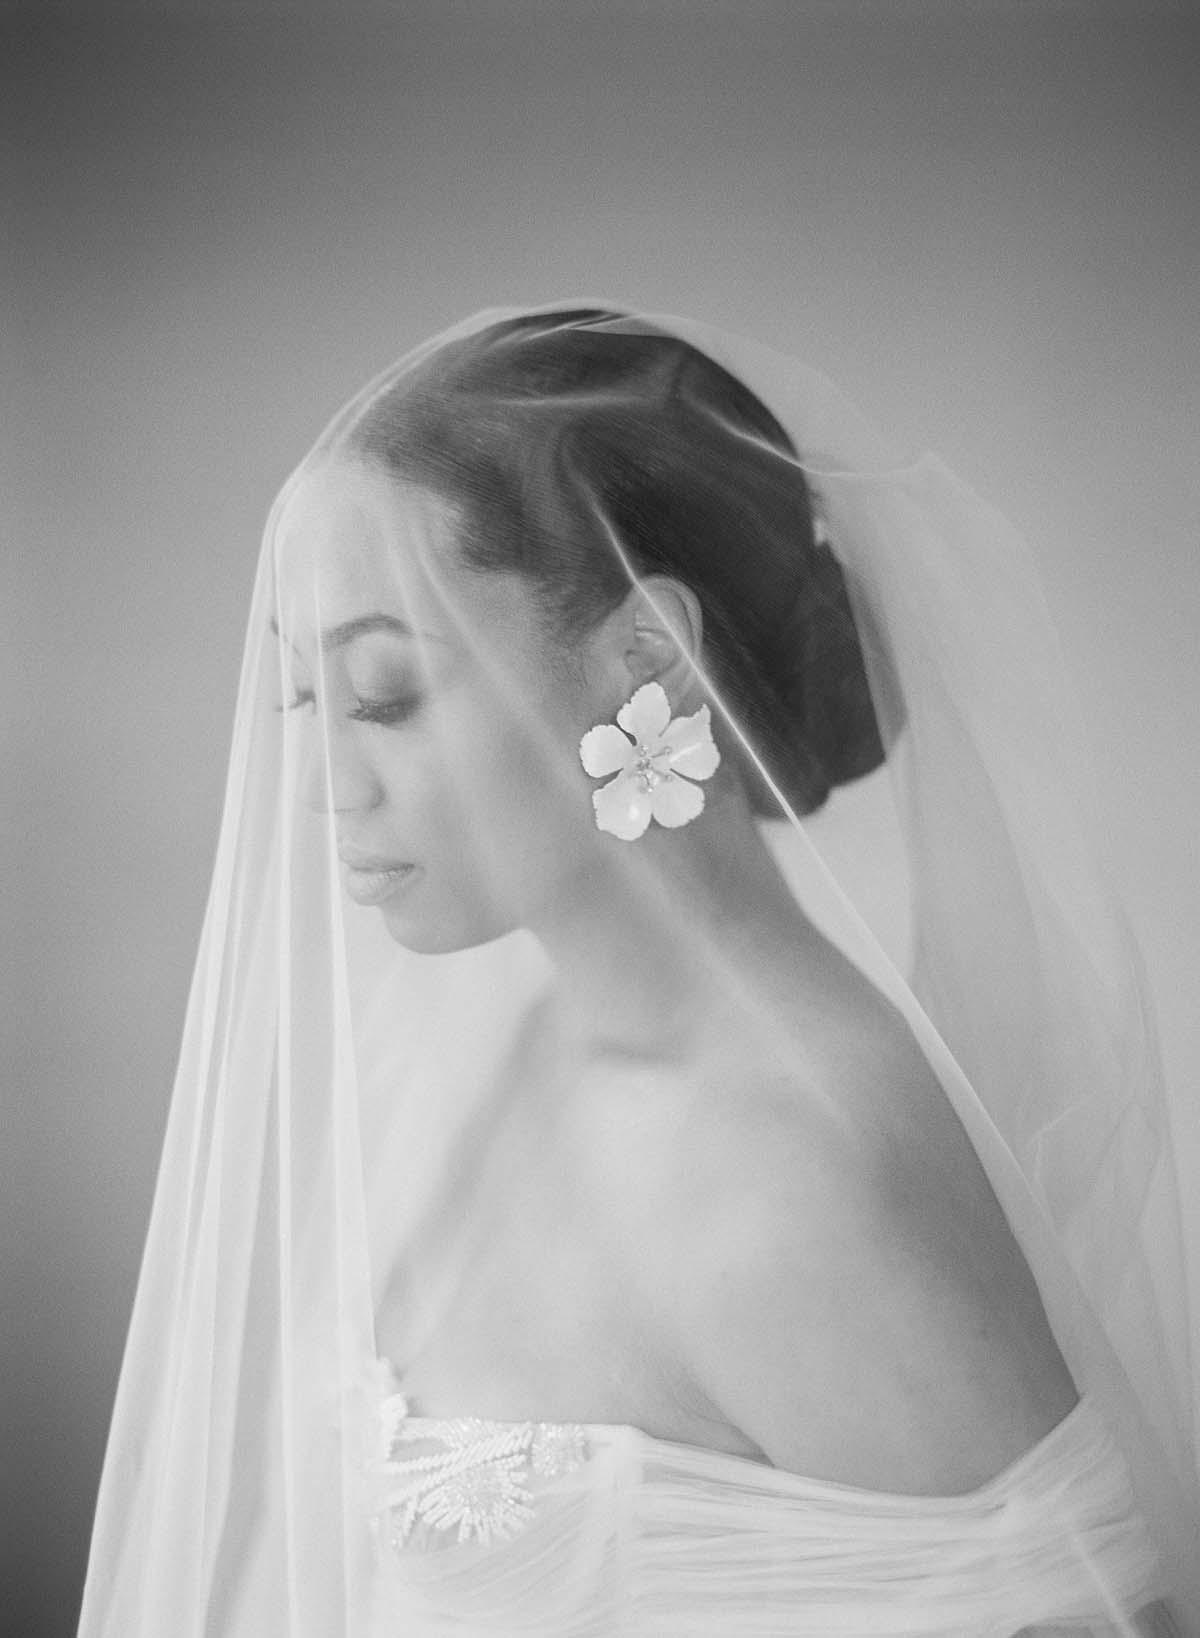 XOXO_BRIDE_Events-Michelle-Beller_Photography_0123